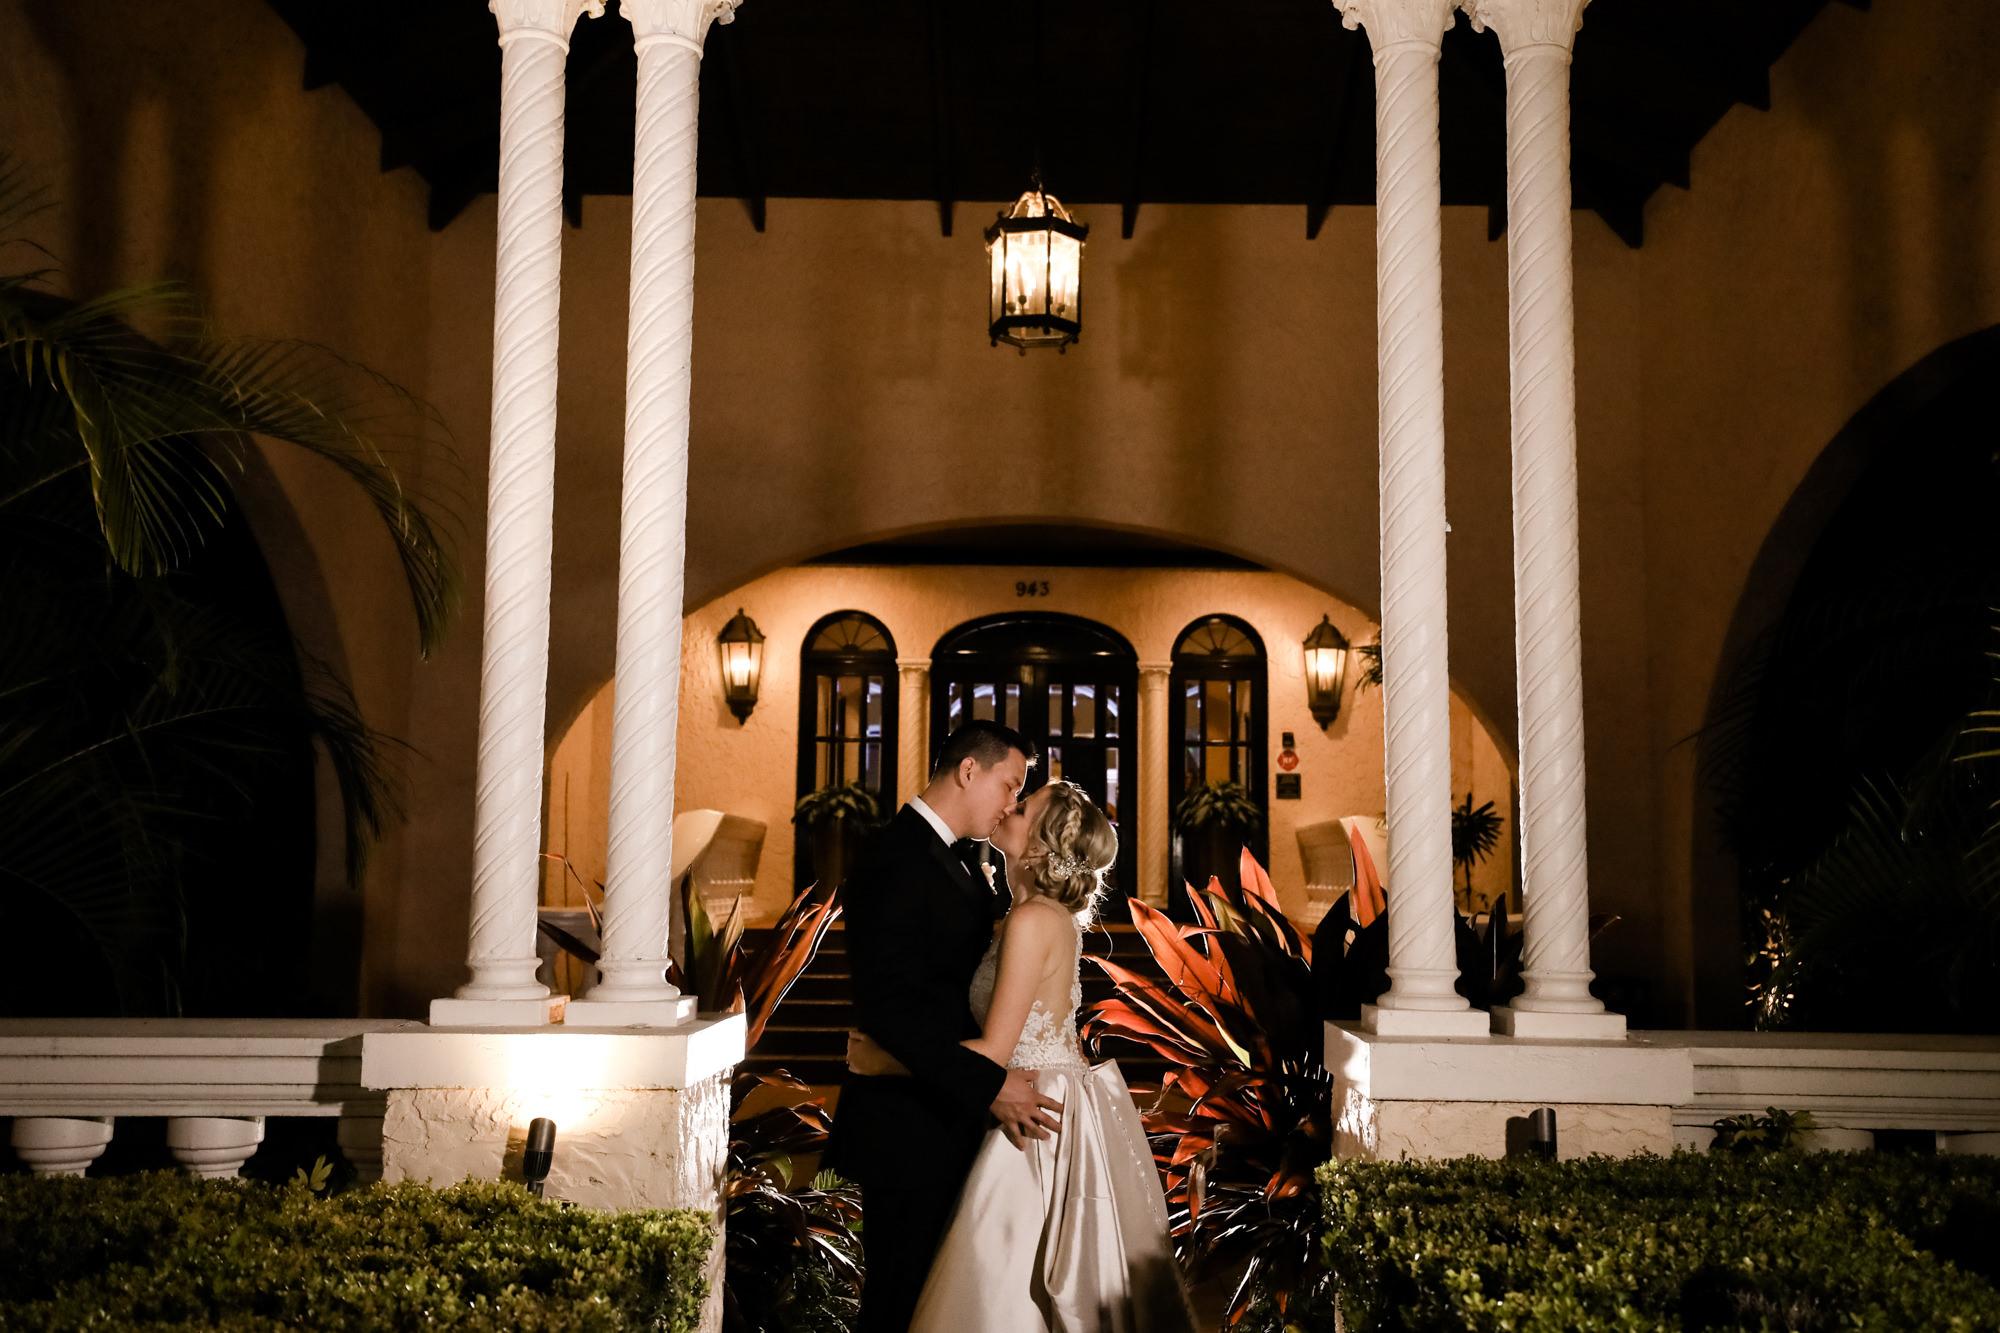 Tampa Wedding Venue Avila Golf & Country Club | Outdoor Twilight Nighttime Bride and Groom Wedding Portraits | Tampa Bay Wedding Photographer Lifelong Photography Studio